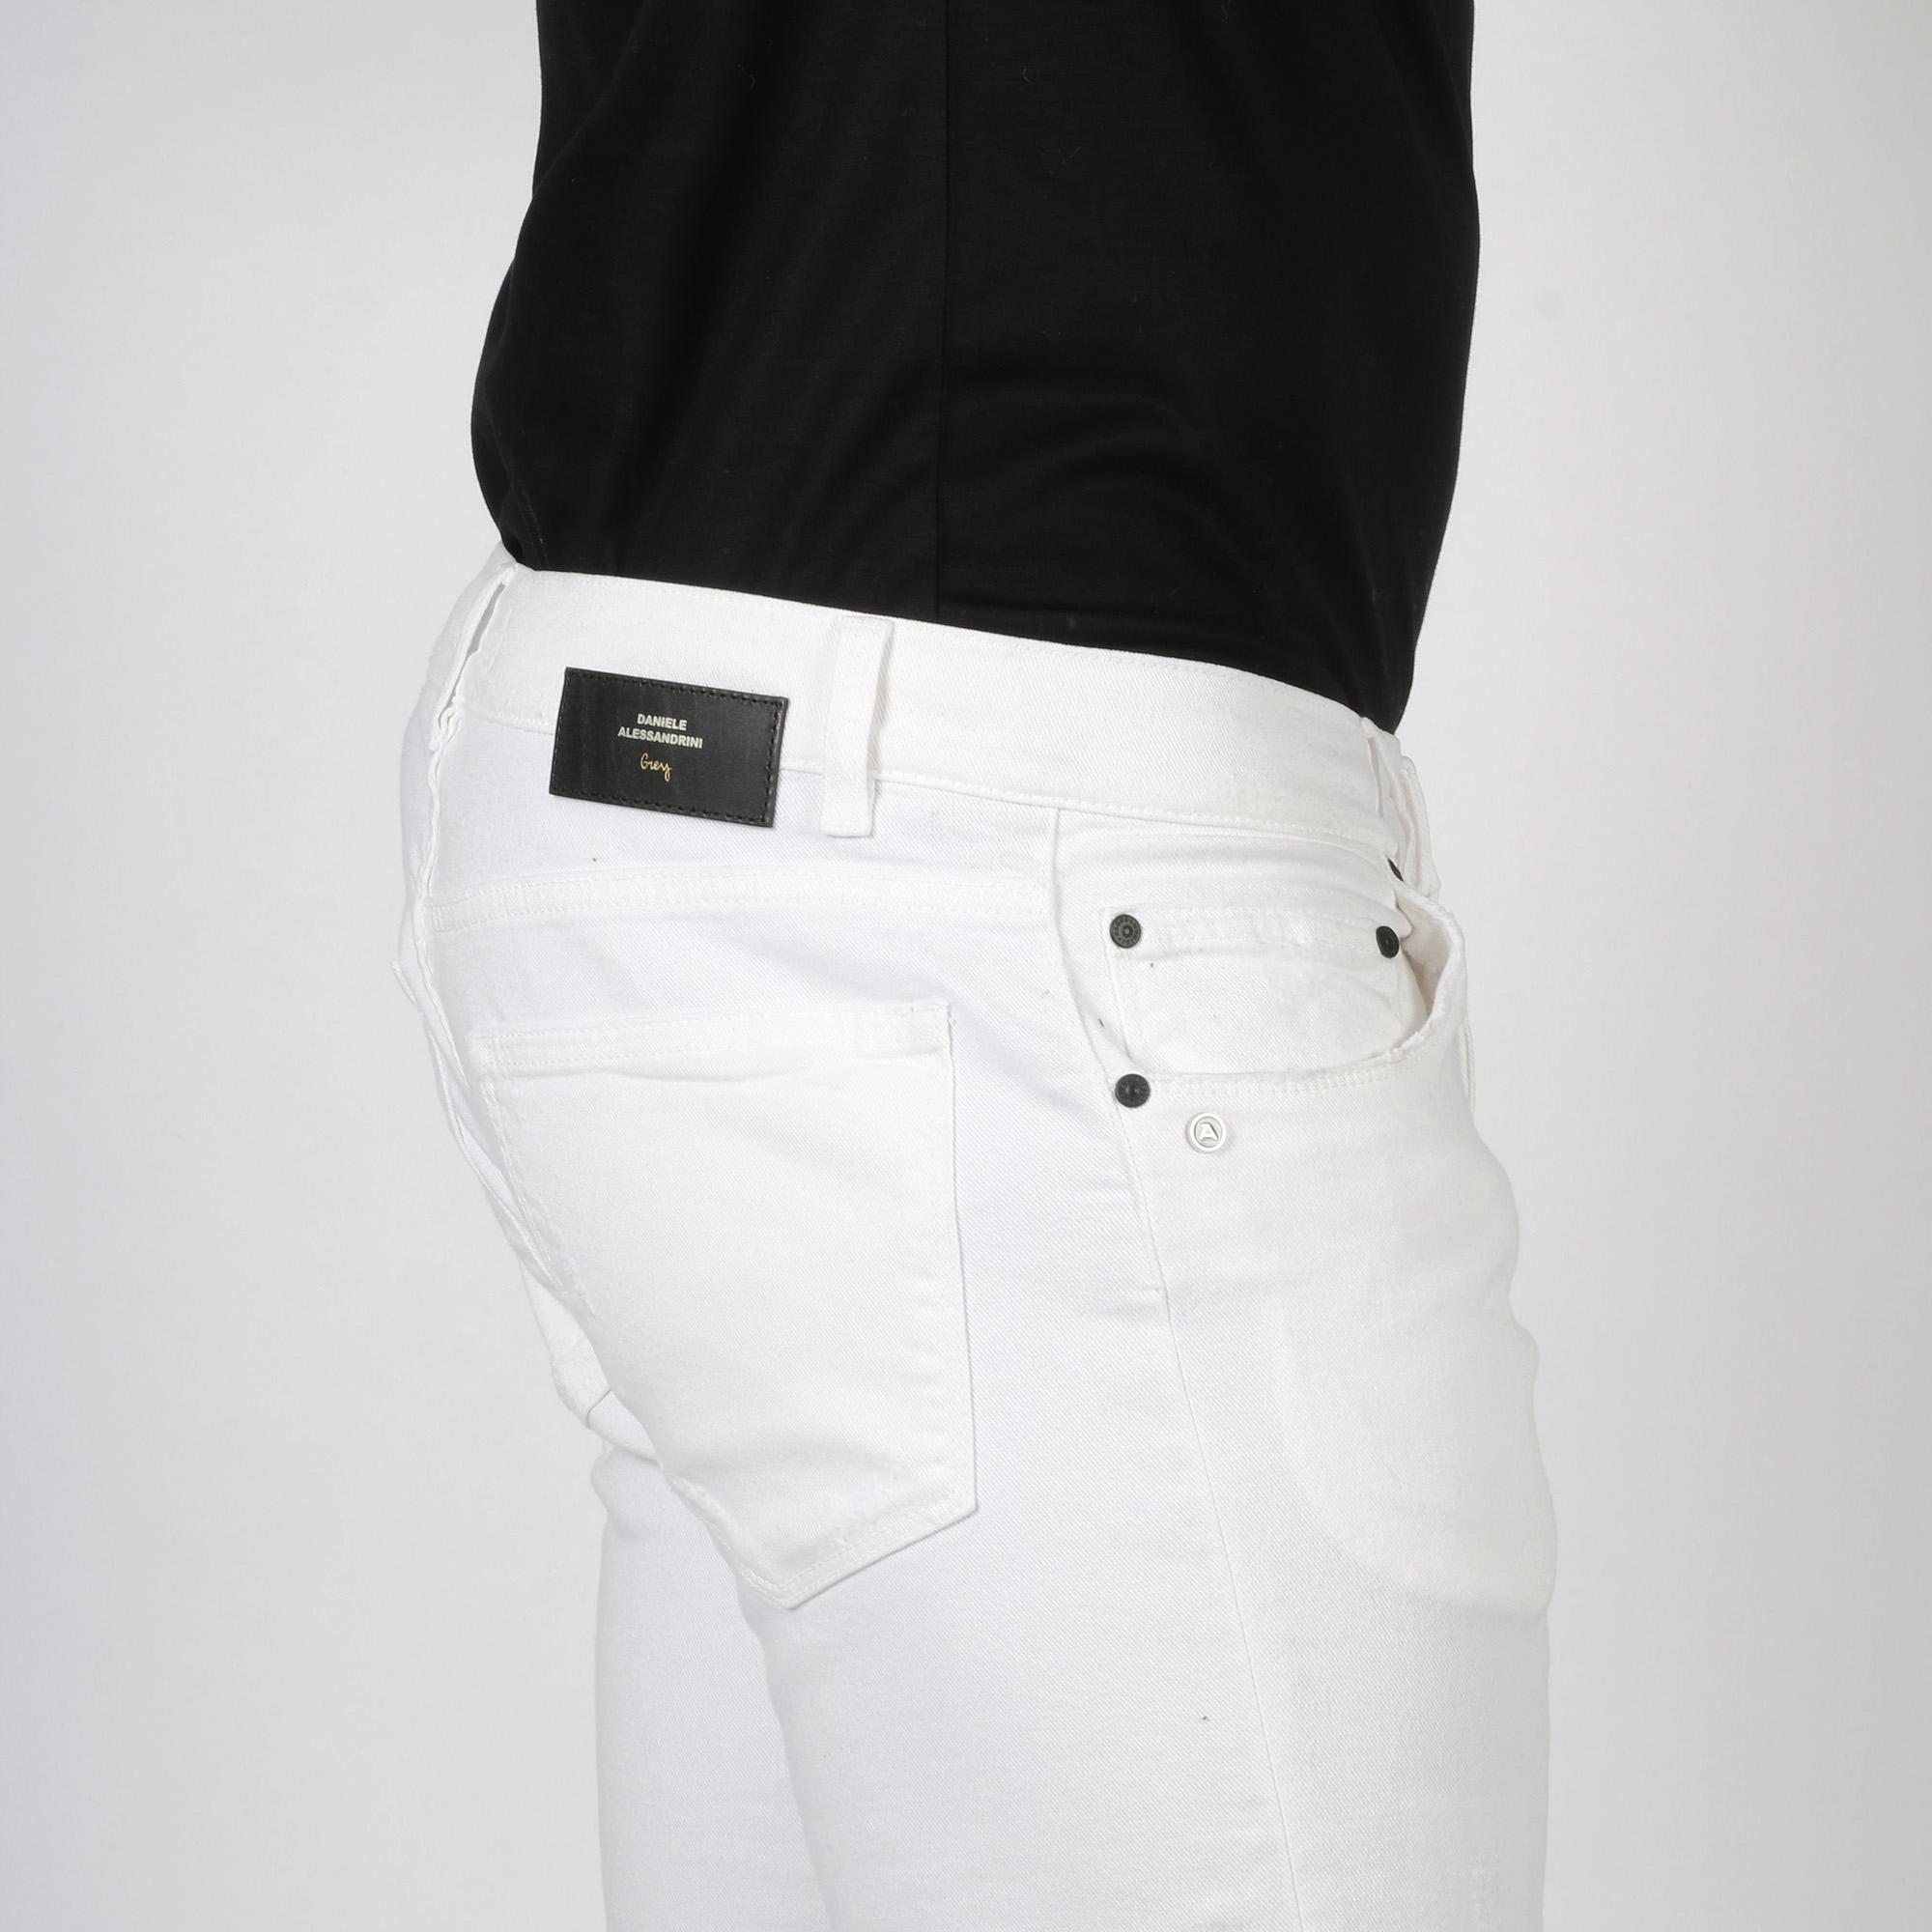 Pantalone 5 tasche grey - Bianco